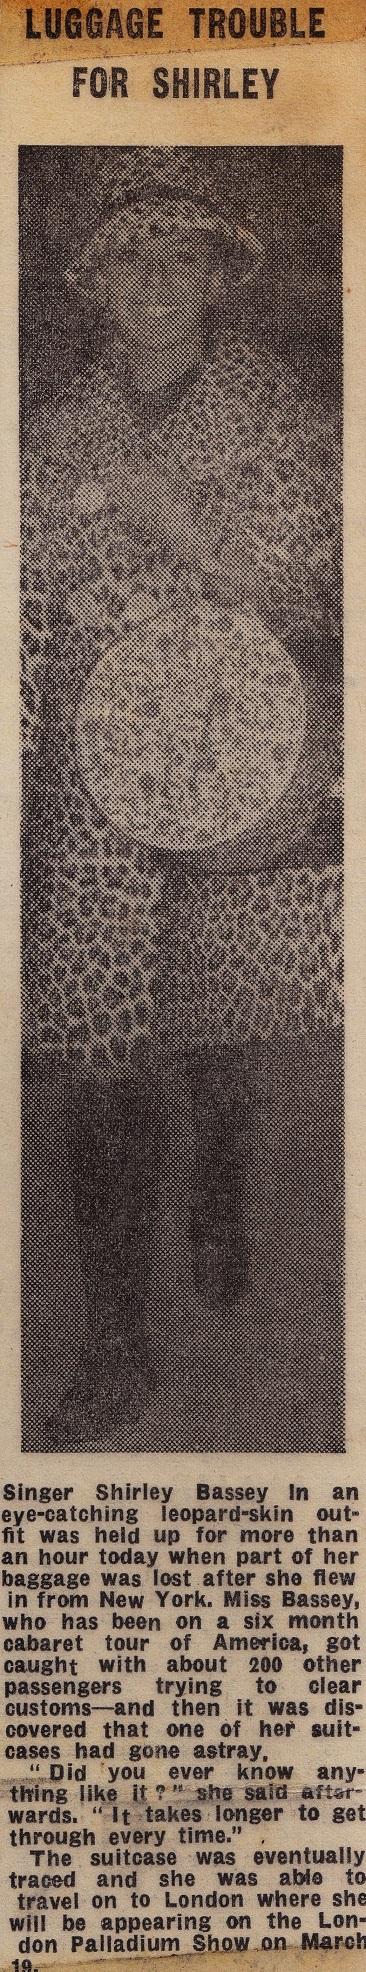 1966 L